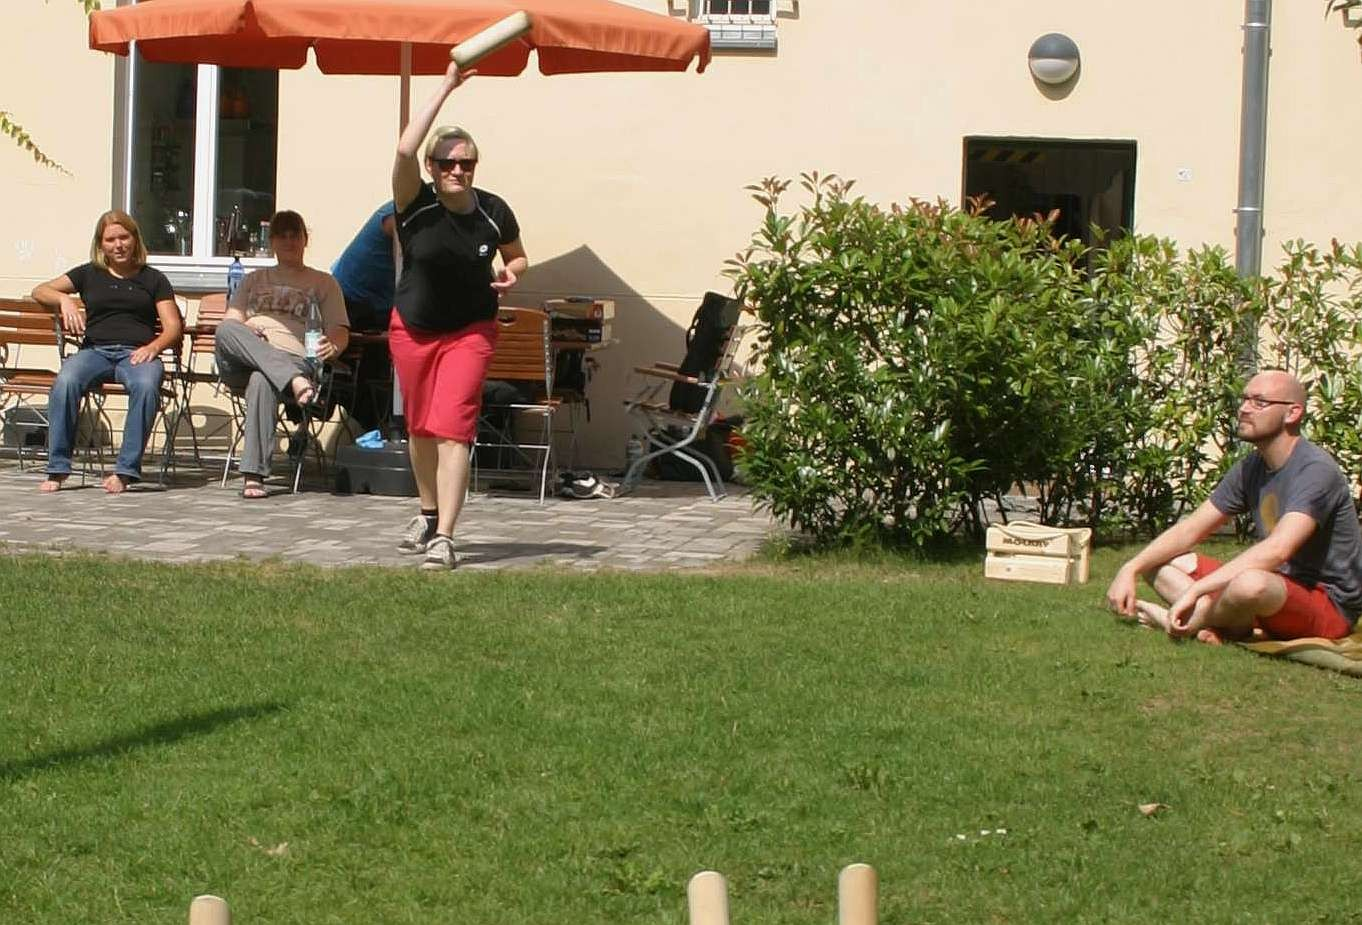 Wikinger-Kegeln (Mölkky) im Garten